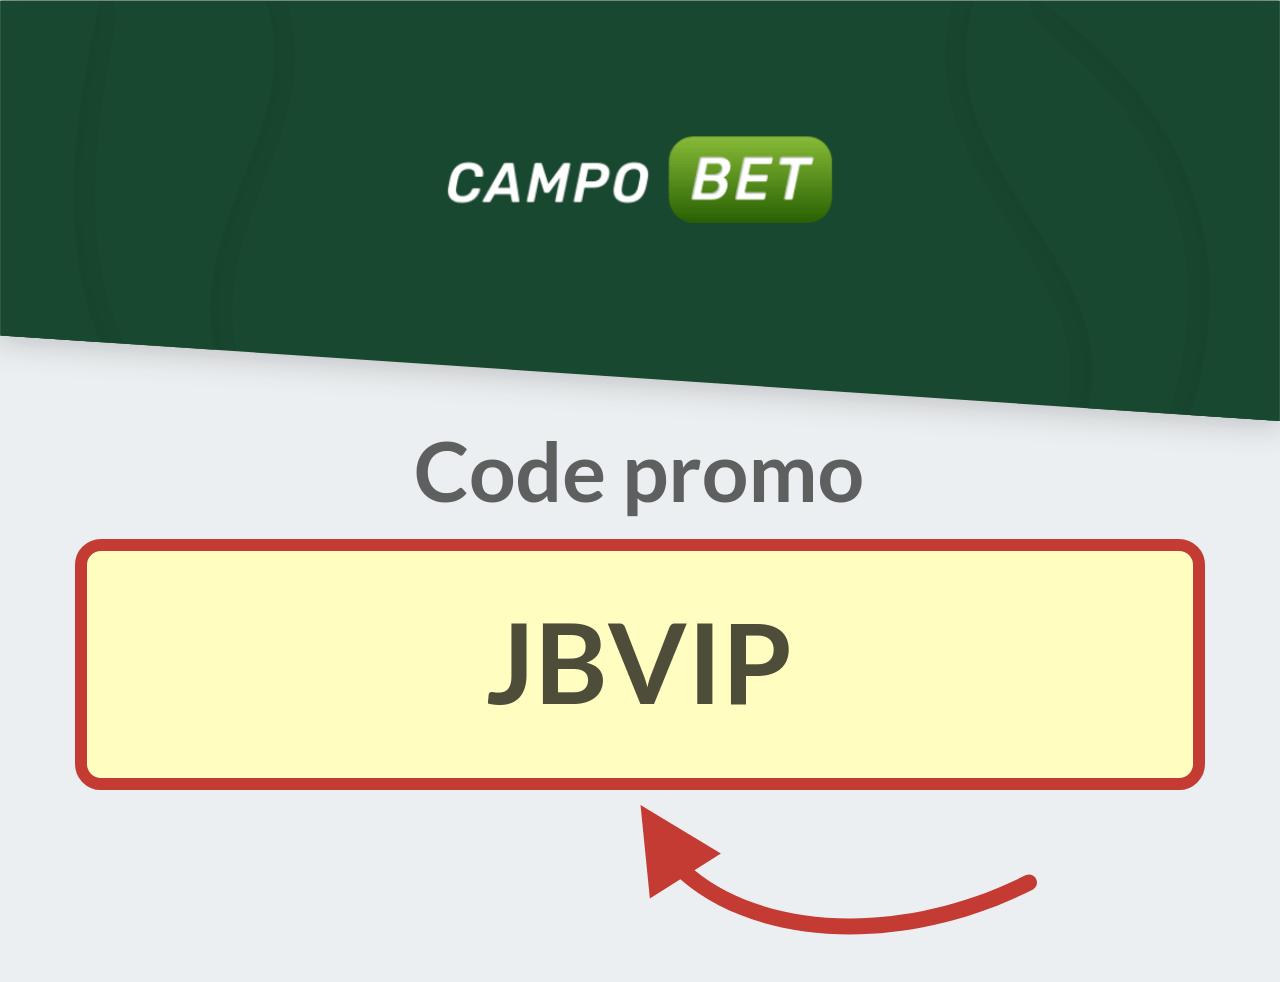 Code Promo Campobet